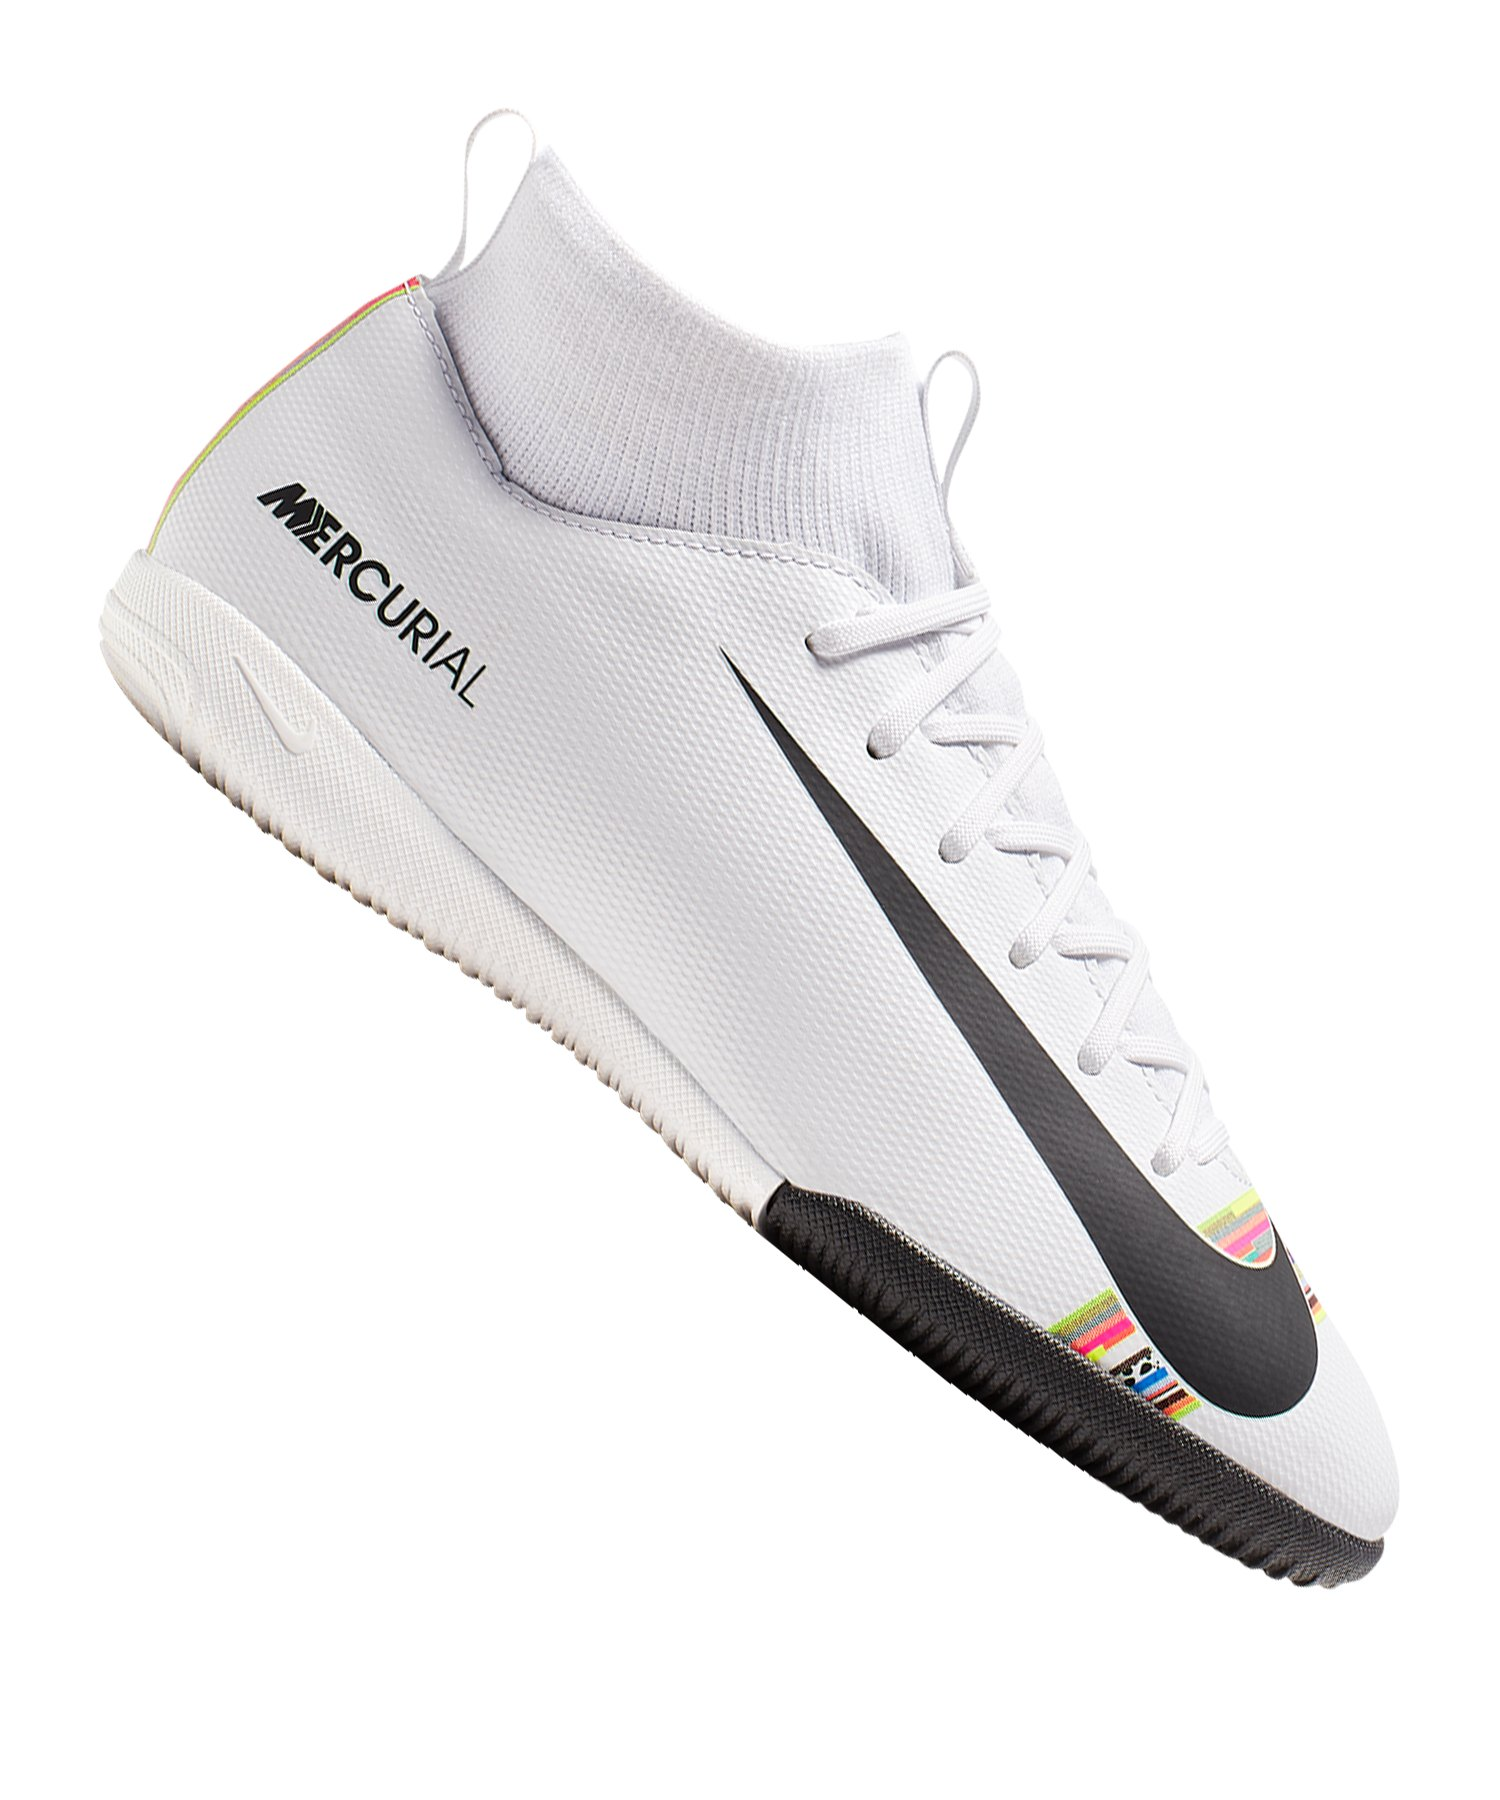 Nike Superfly 6 Academy Fussballschuhe Halle Ic Kinder Schuhe